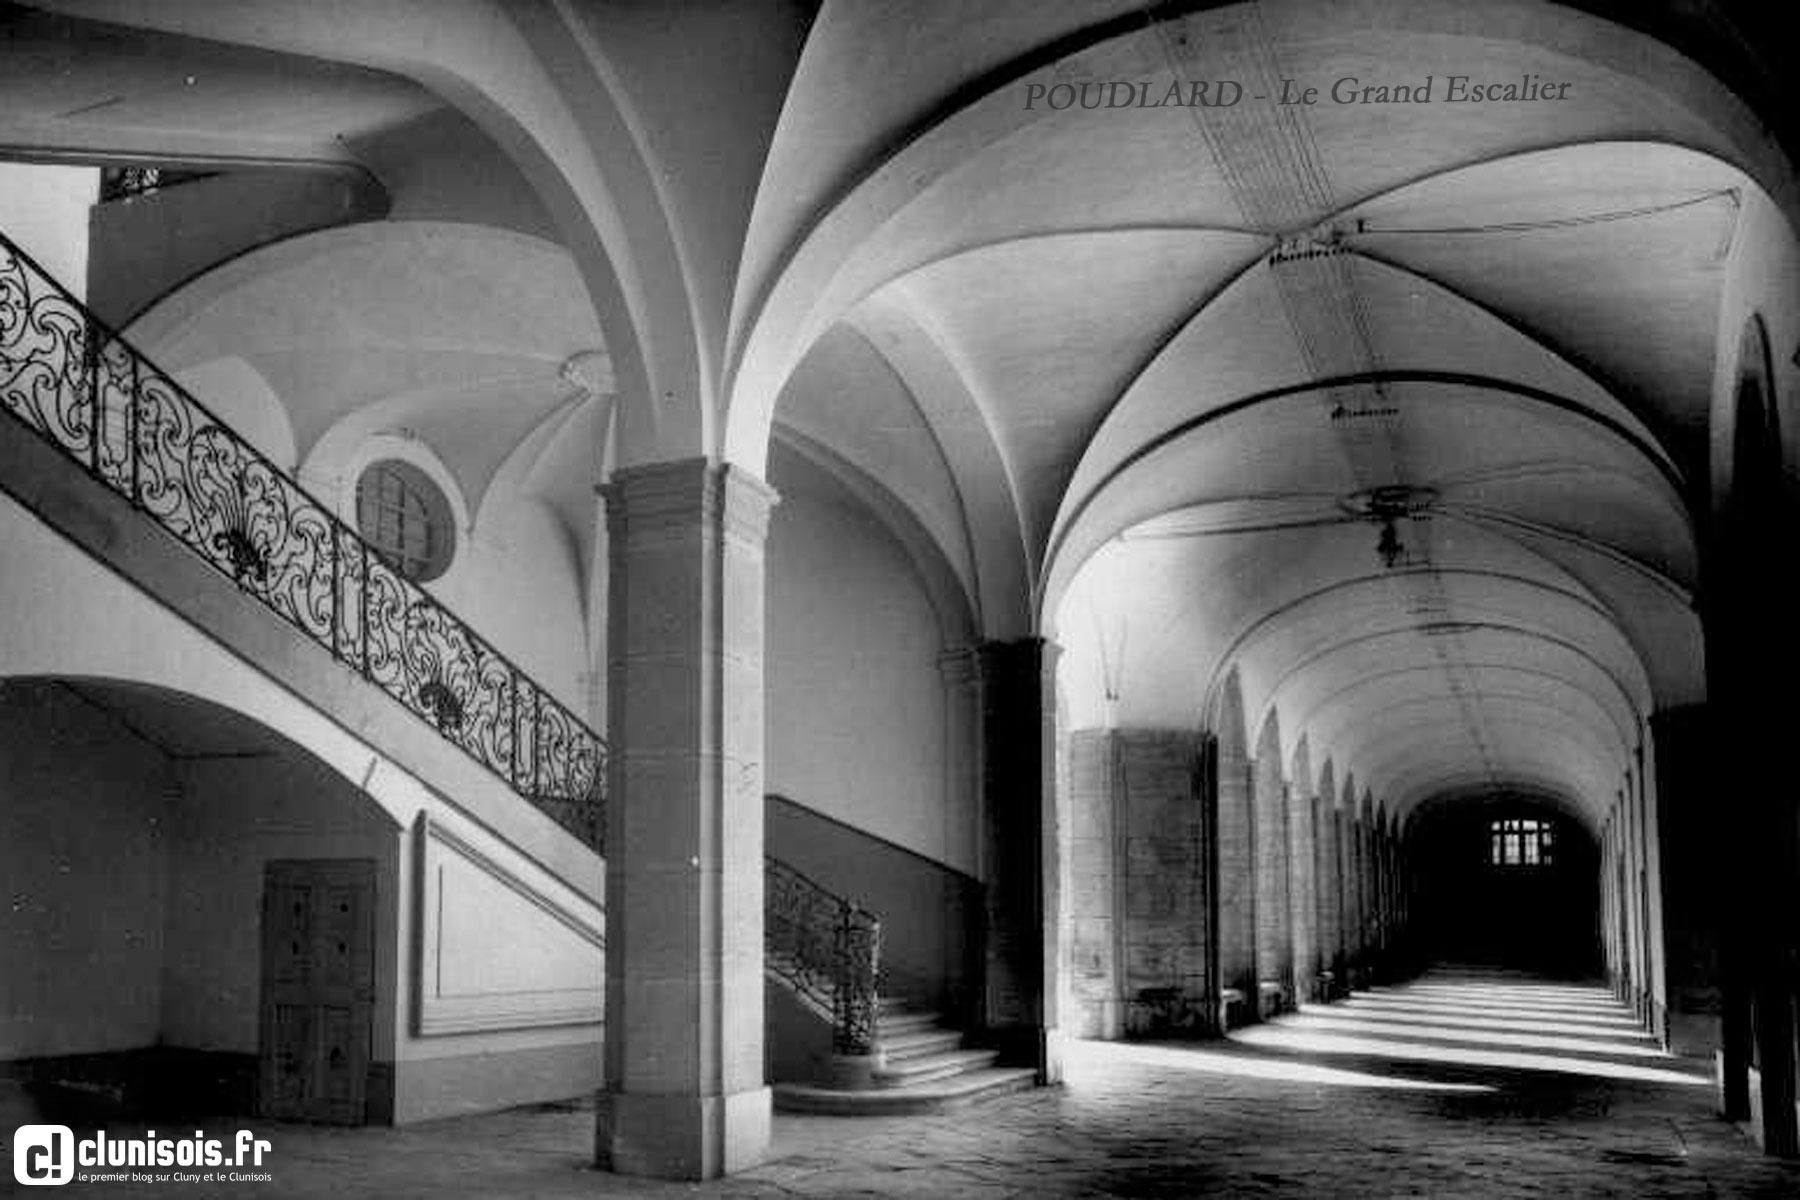 03-poudlard-existe-grand-escalier-clunisoisfr